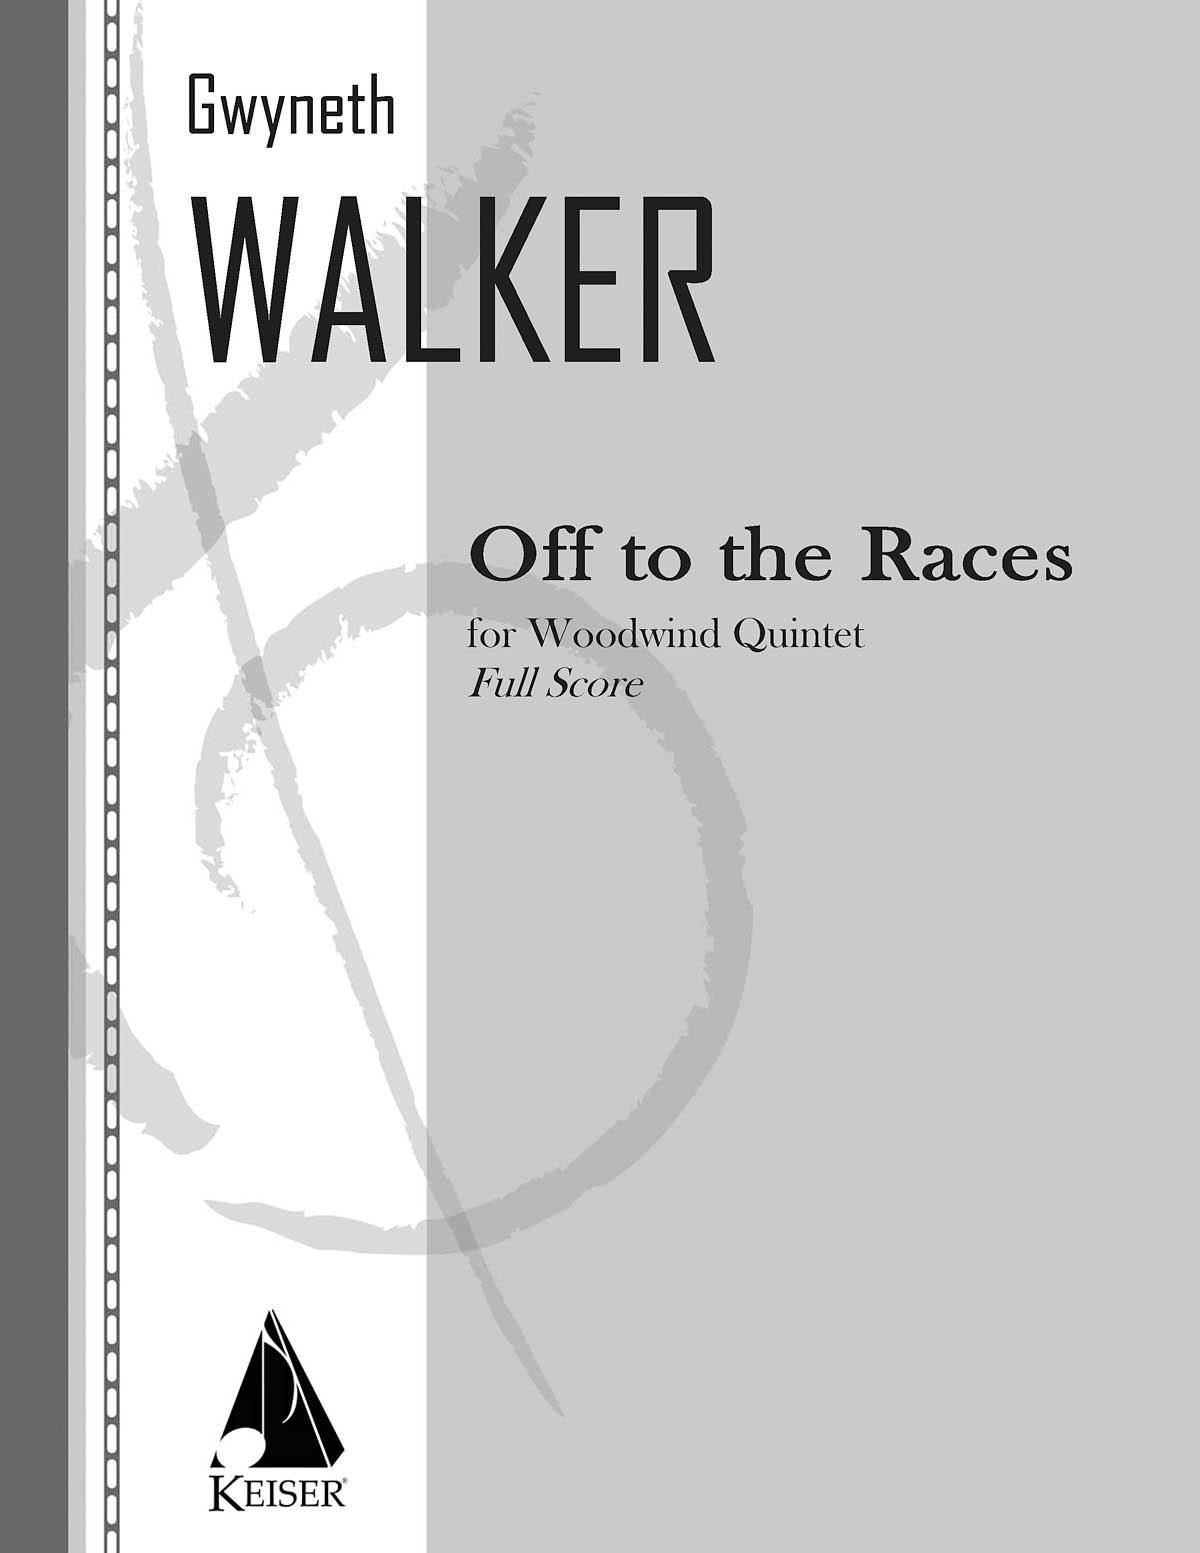 Gwyneth Walker: Off to the Races for Woodwind Quintet  Full Score: Woodwind